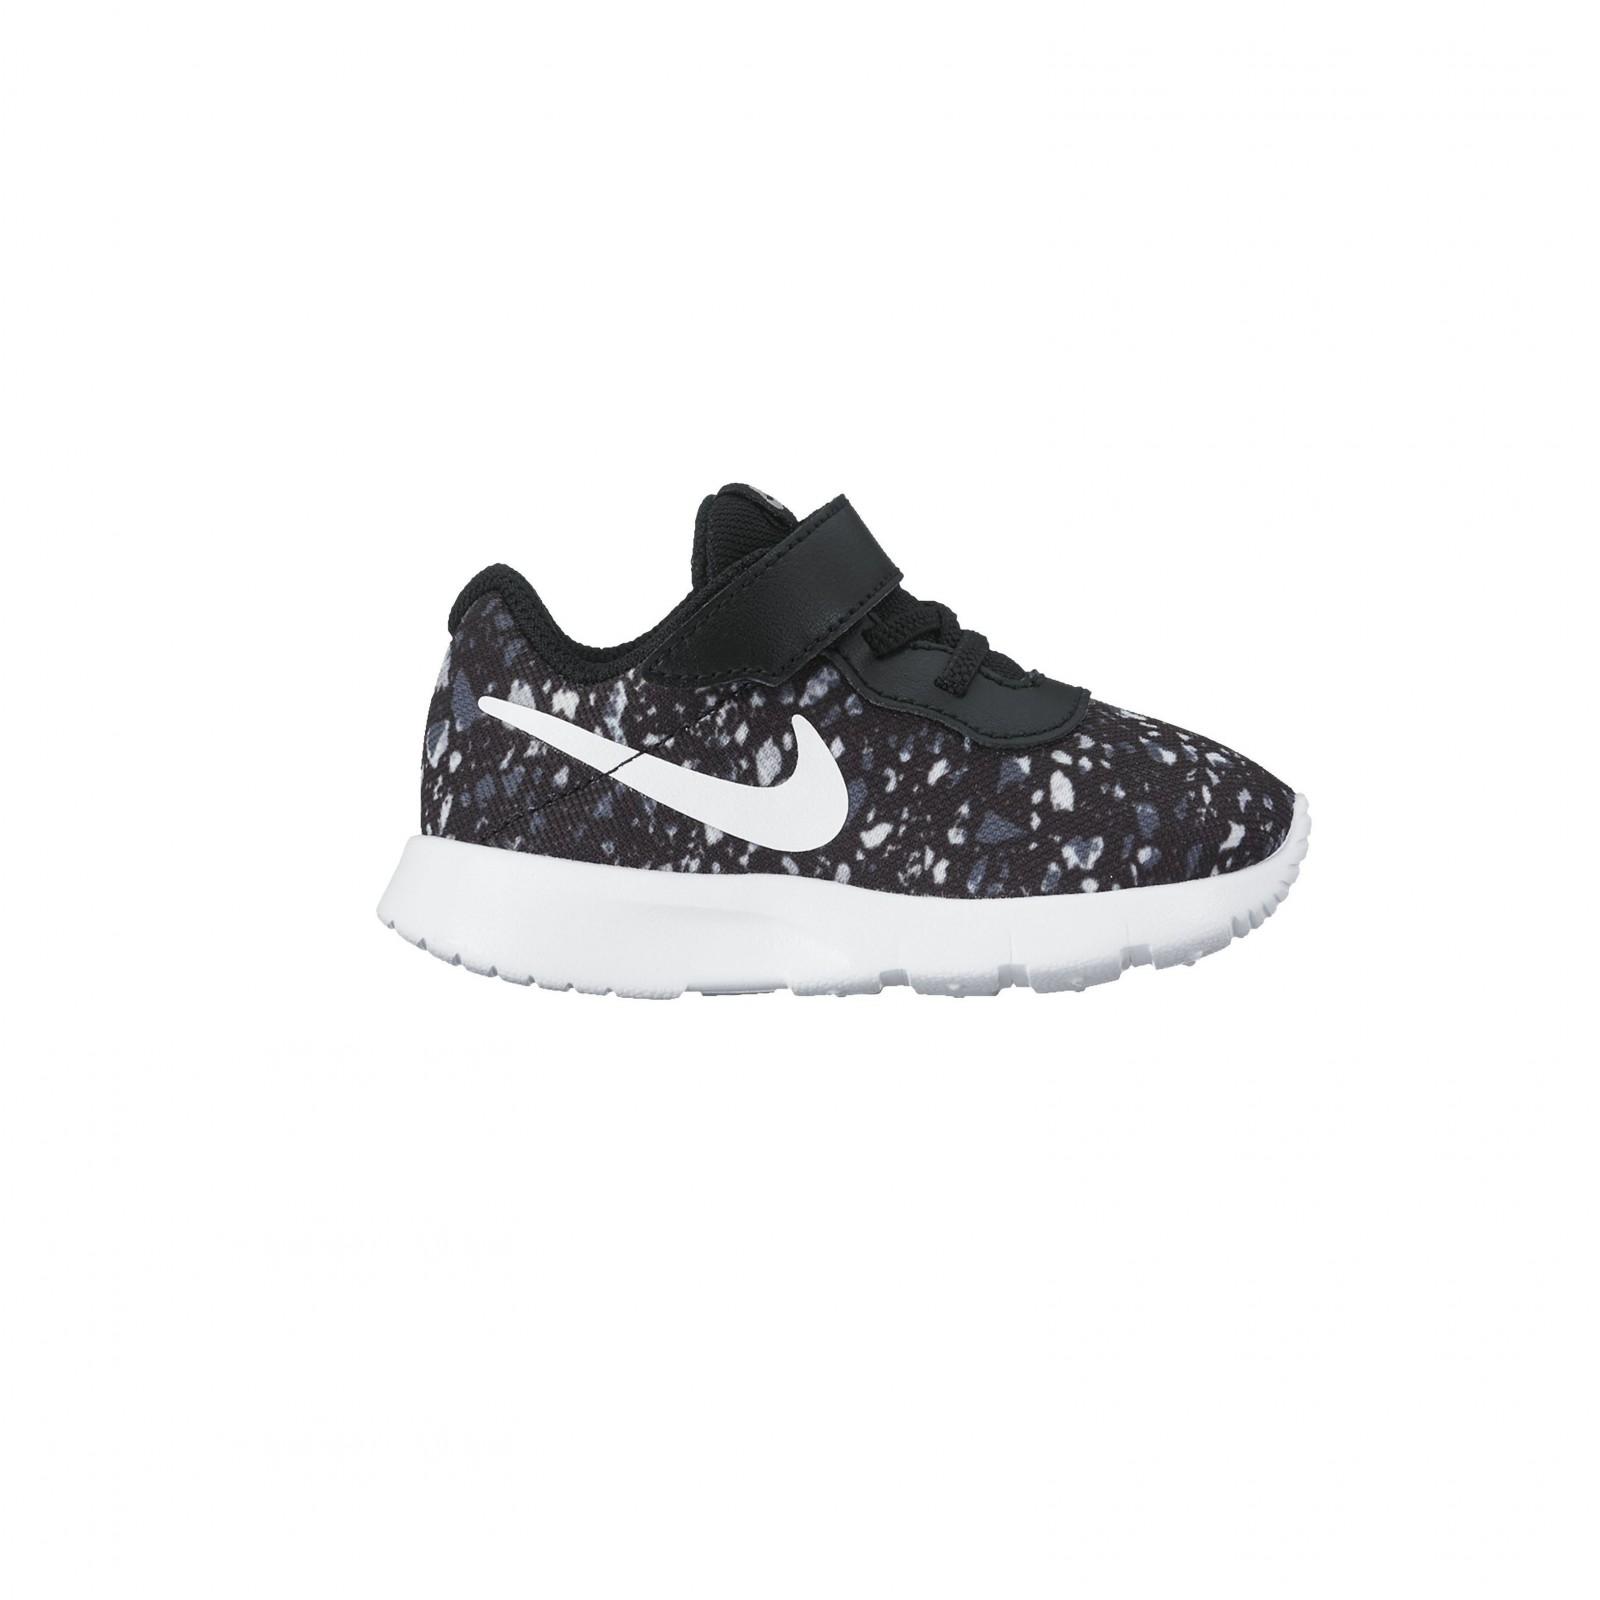 Dětské tenisky Nike TANJUN PRINT (TDV)  1cd36405dd